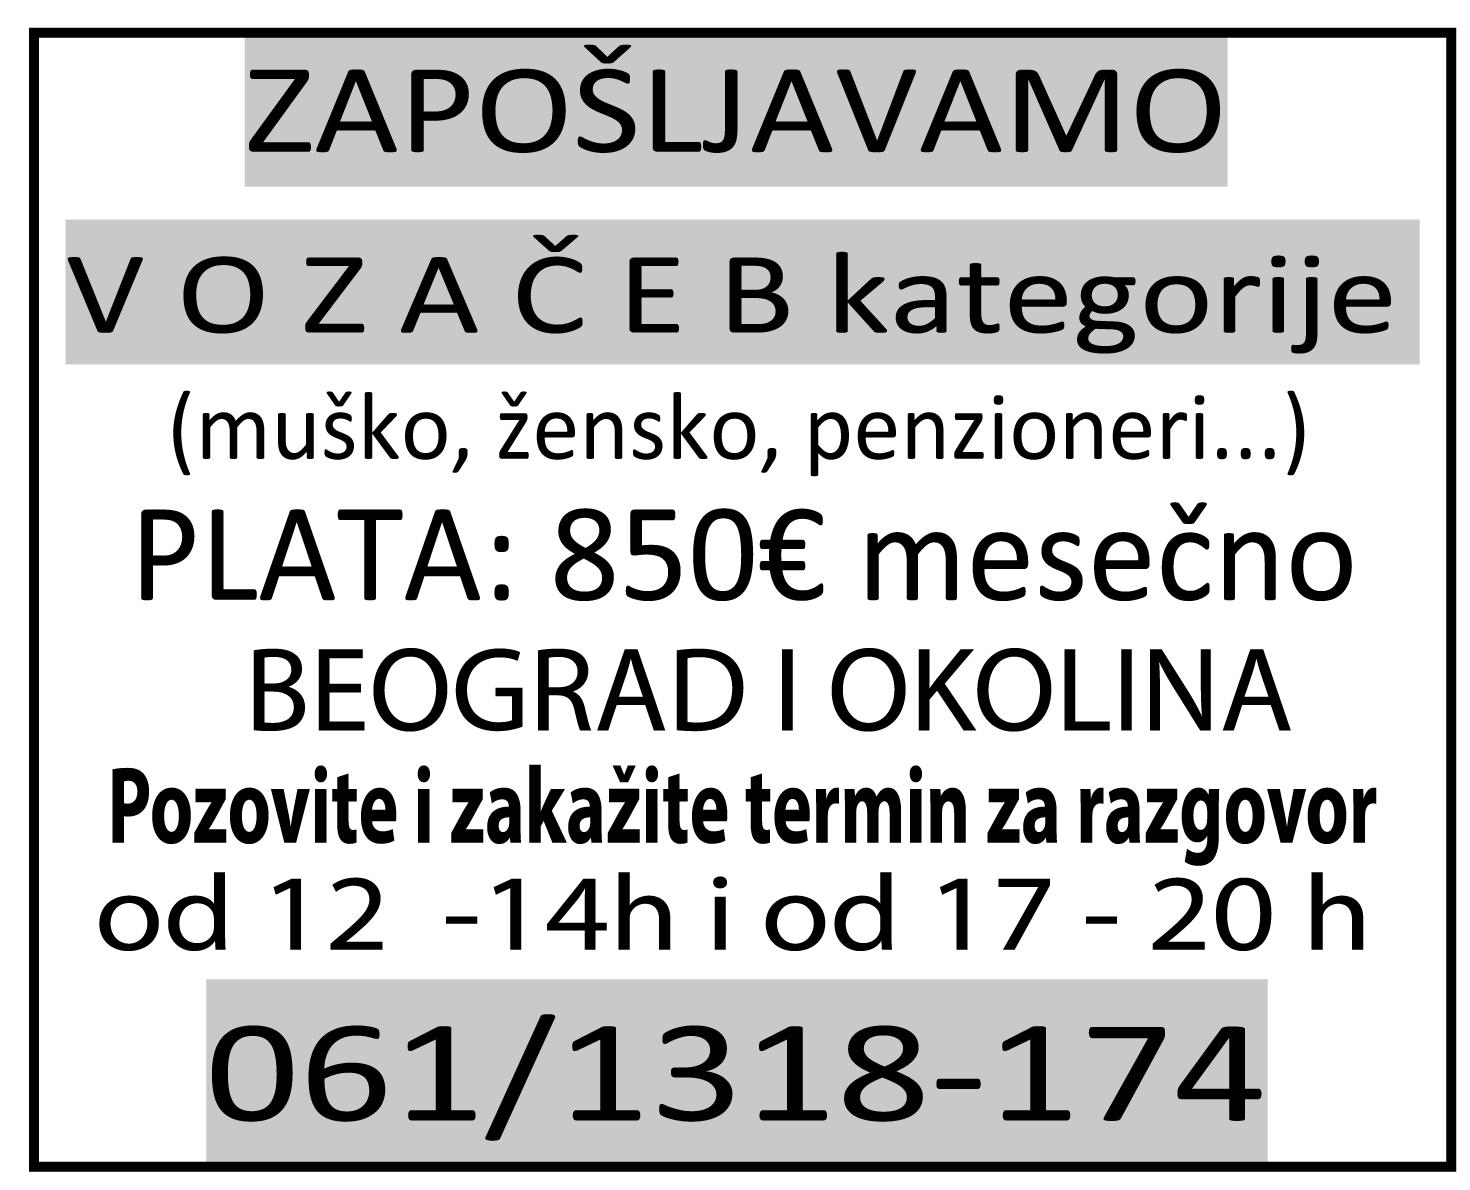 potreban-vozac-radnik-plata-topjob-driver-posao-zaposlenje-beograd-reklame-oglasavanje-marketing-mojabaza1(1)